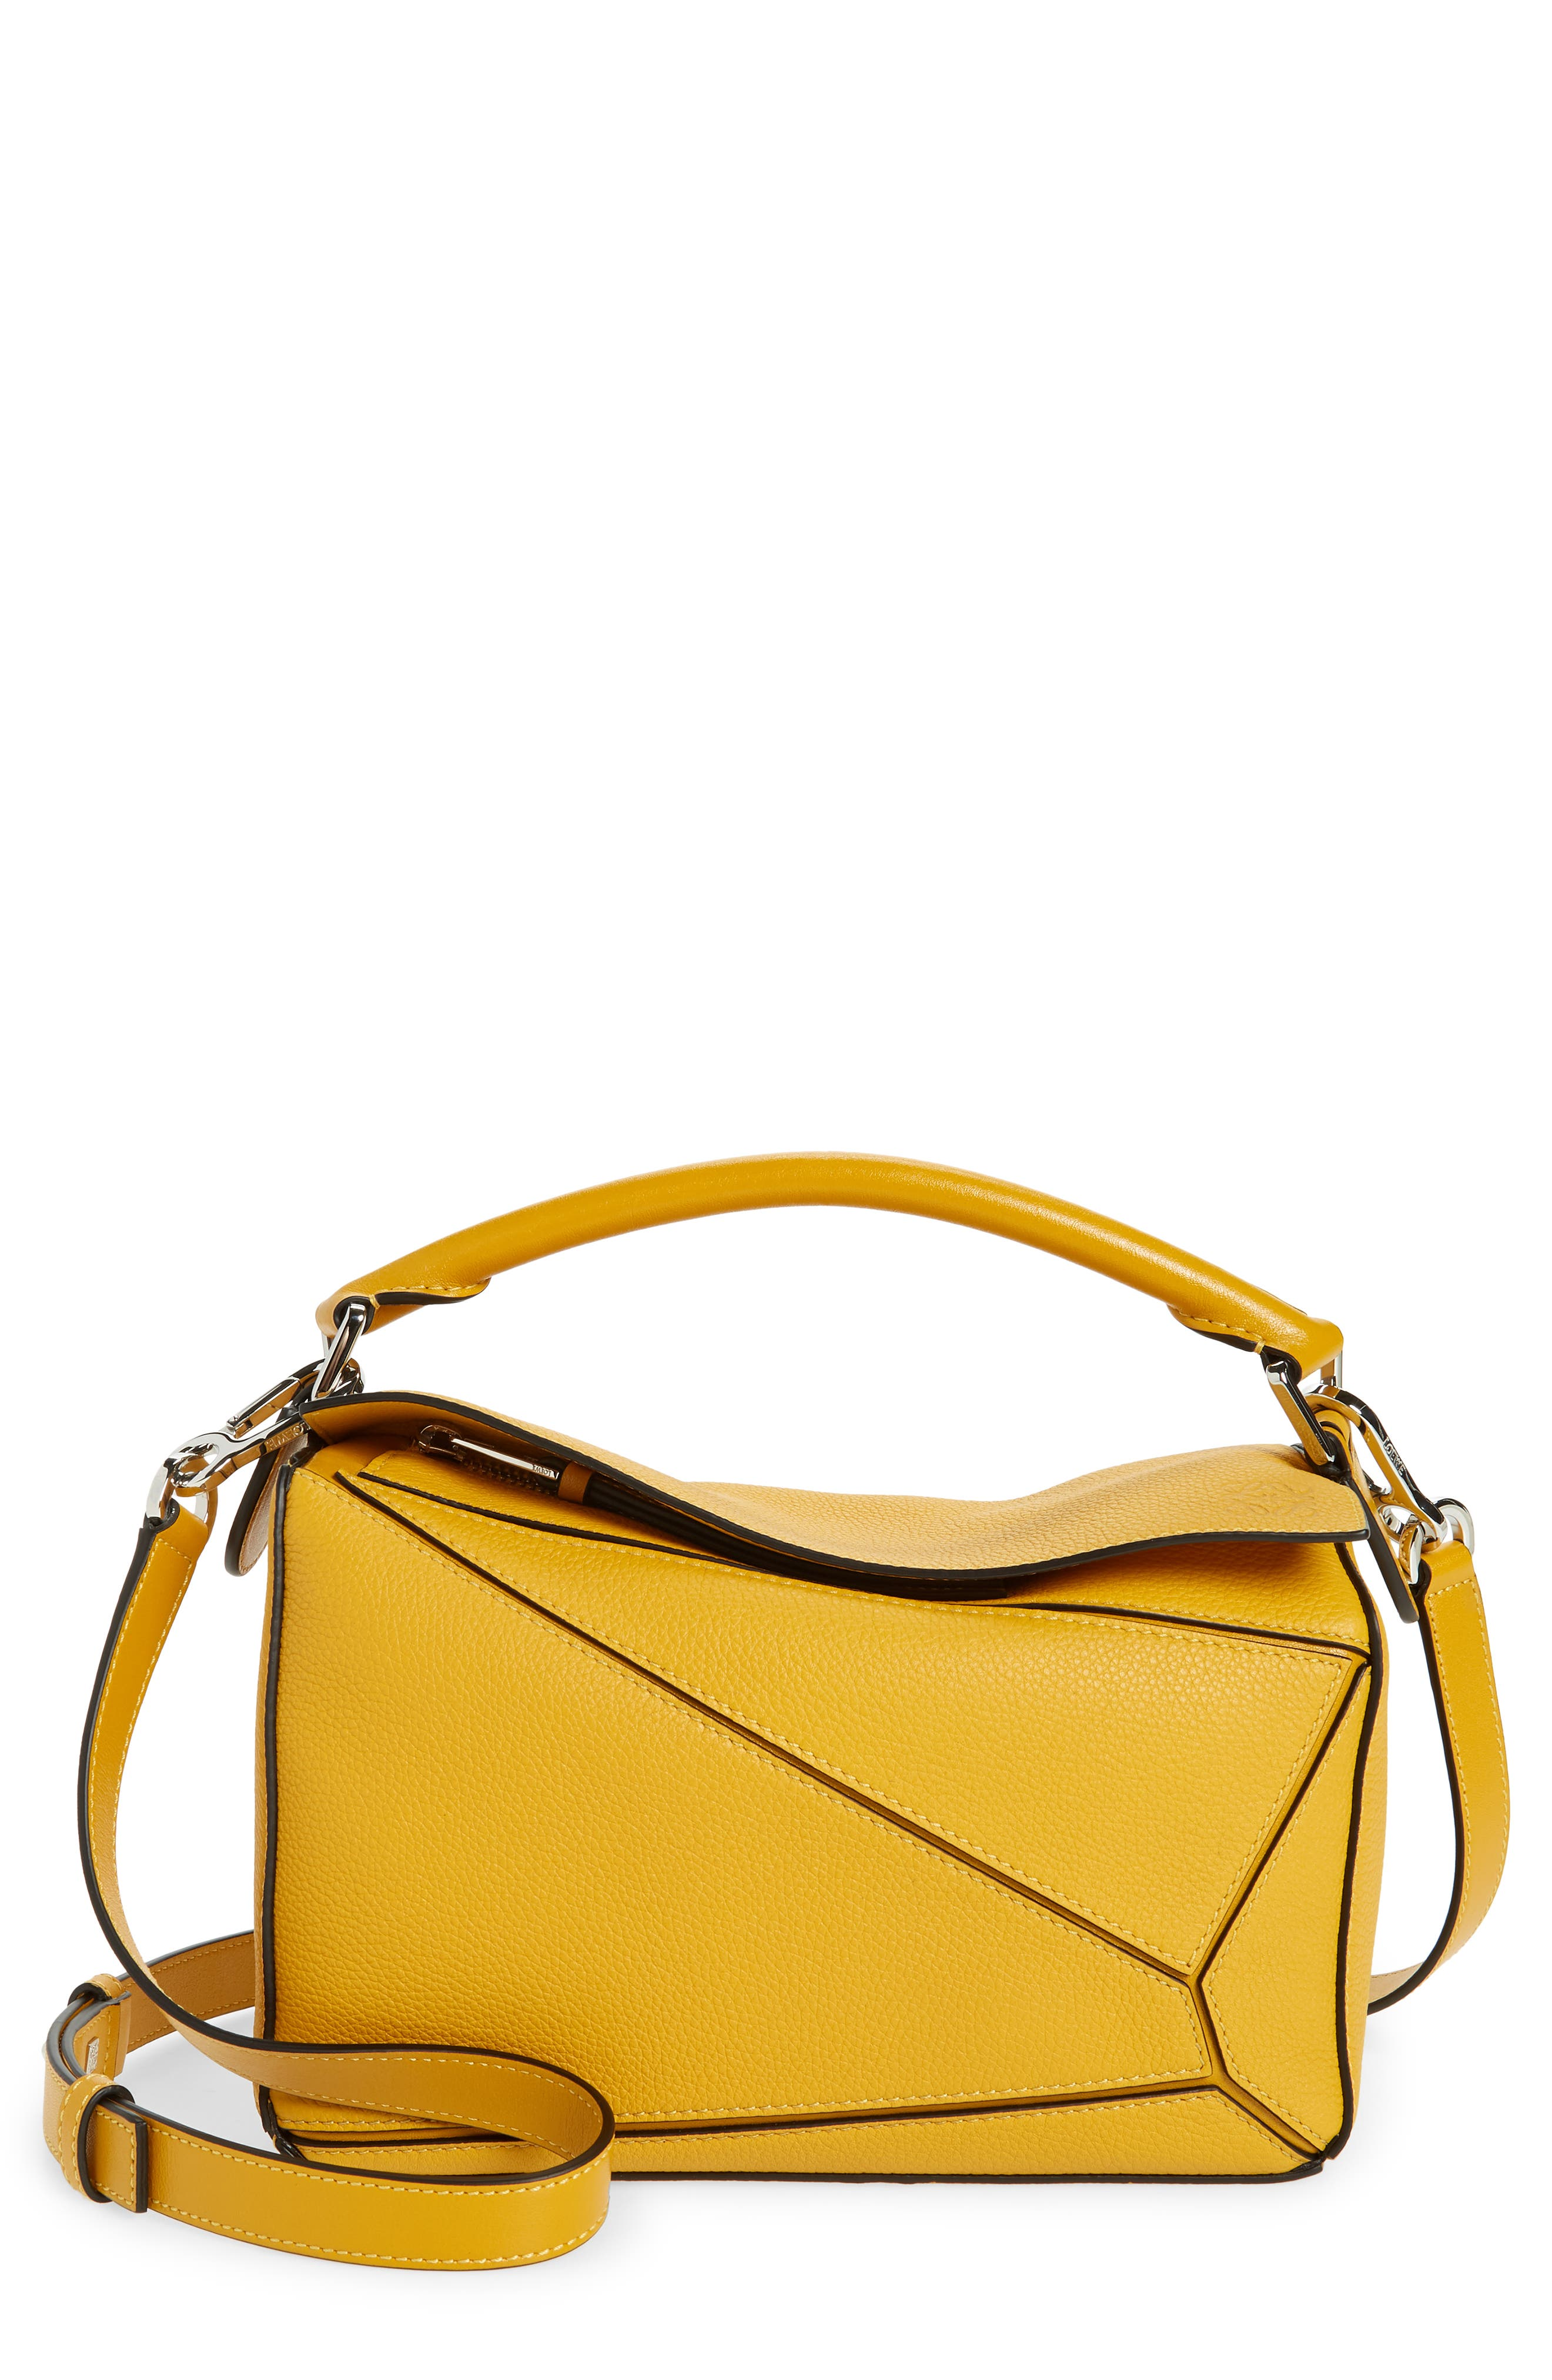 Loewe Small Puzzle Leather Shoulder Bag   Nordstrom